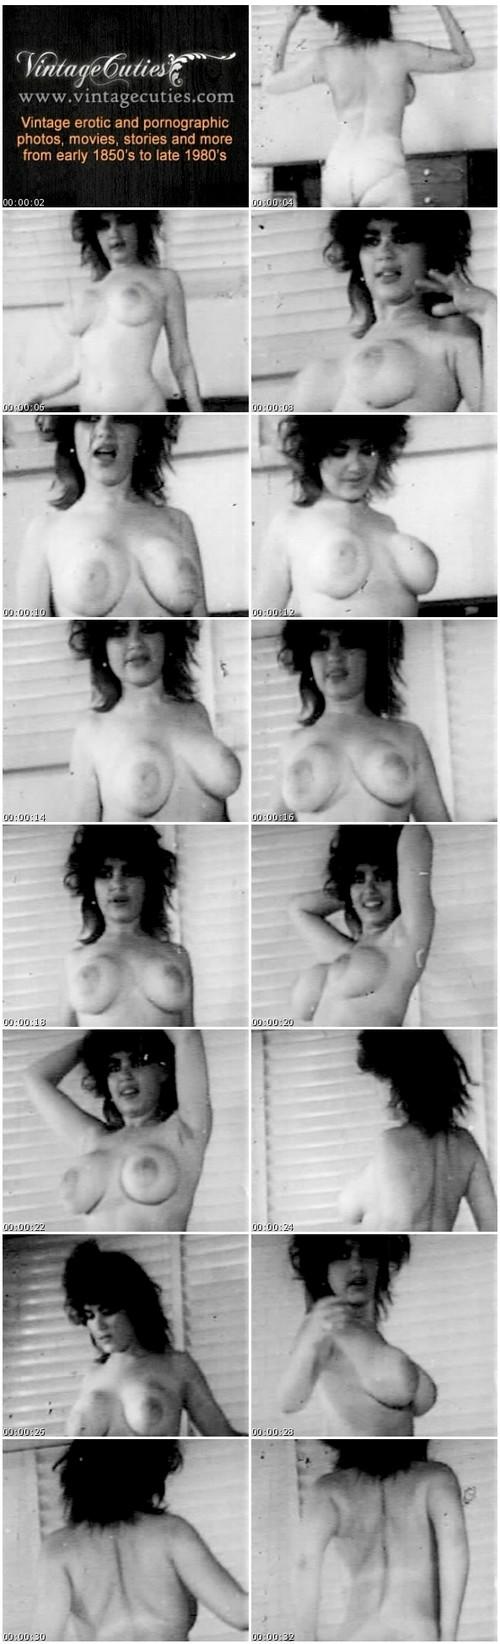 http://ist3-7.filesor.com/pimpandhost.com/9/6/8/3/96838/5/c/N/e/5cNeK/VintageCuties023_thumb_m.jpg